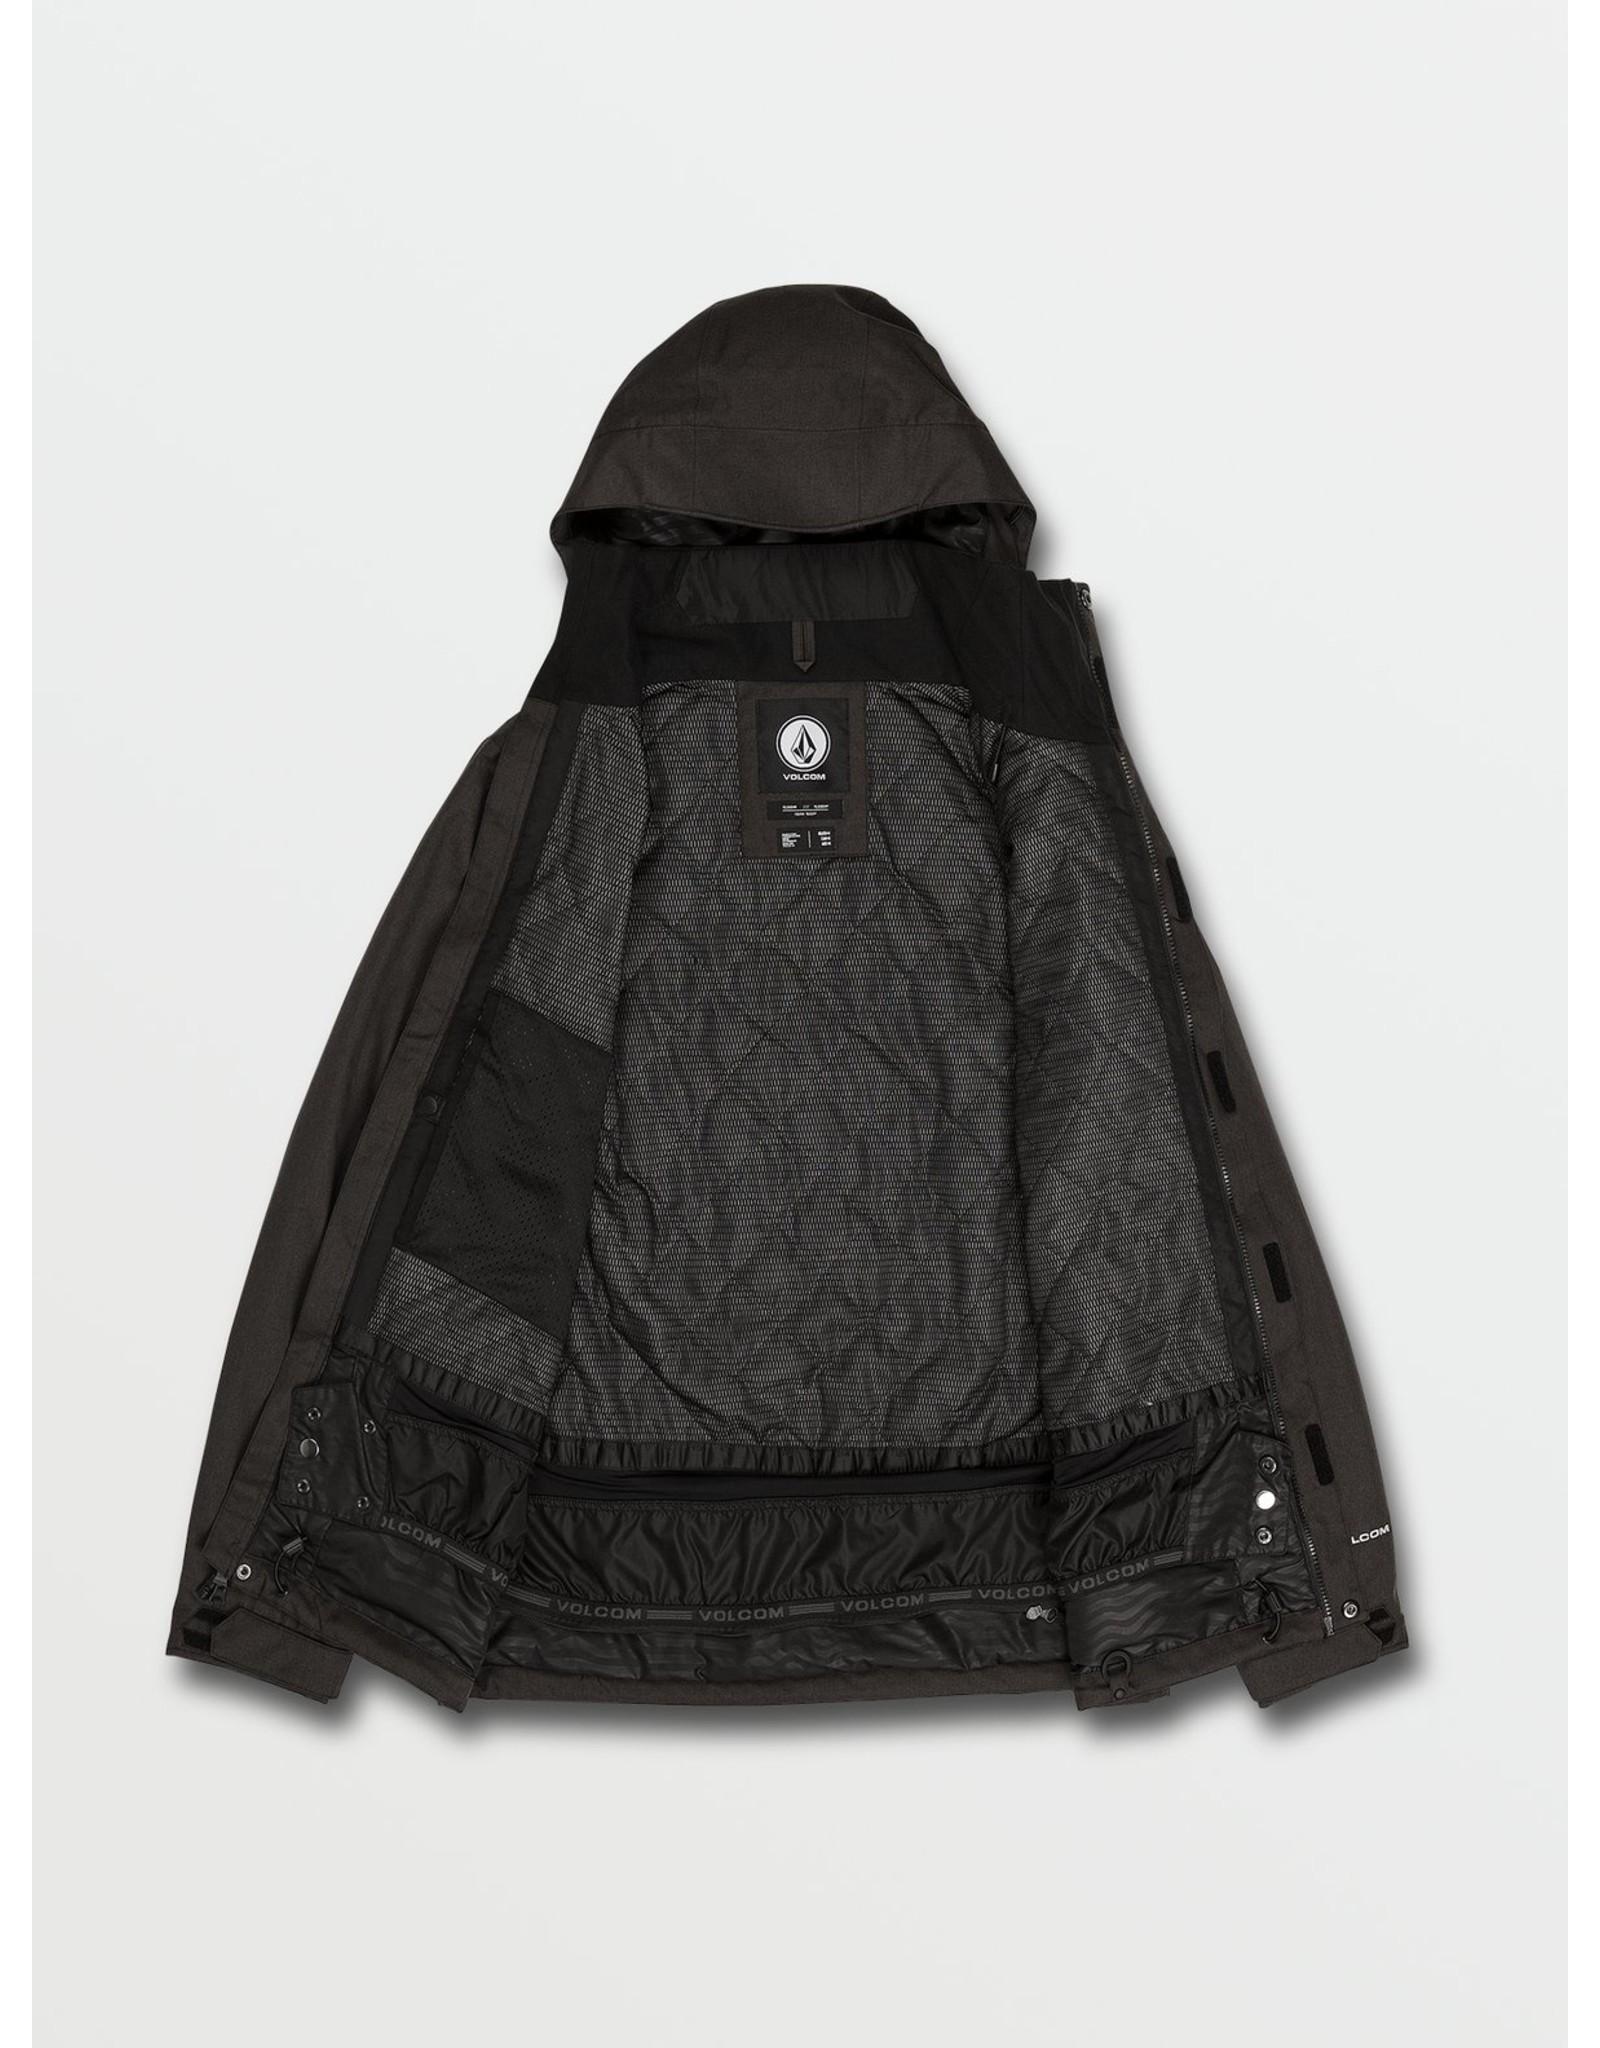 VOLCOM Scortch Insulated Jacket